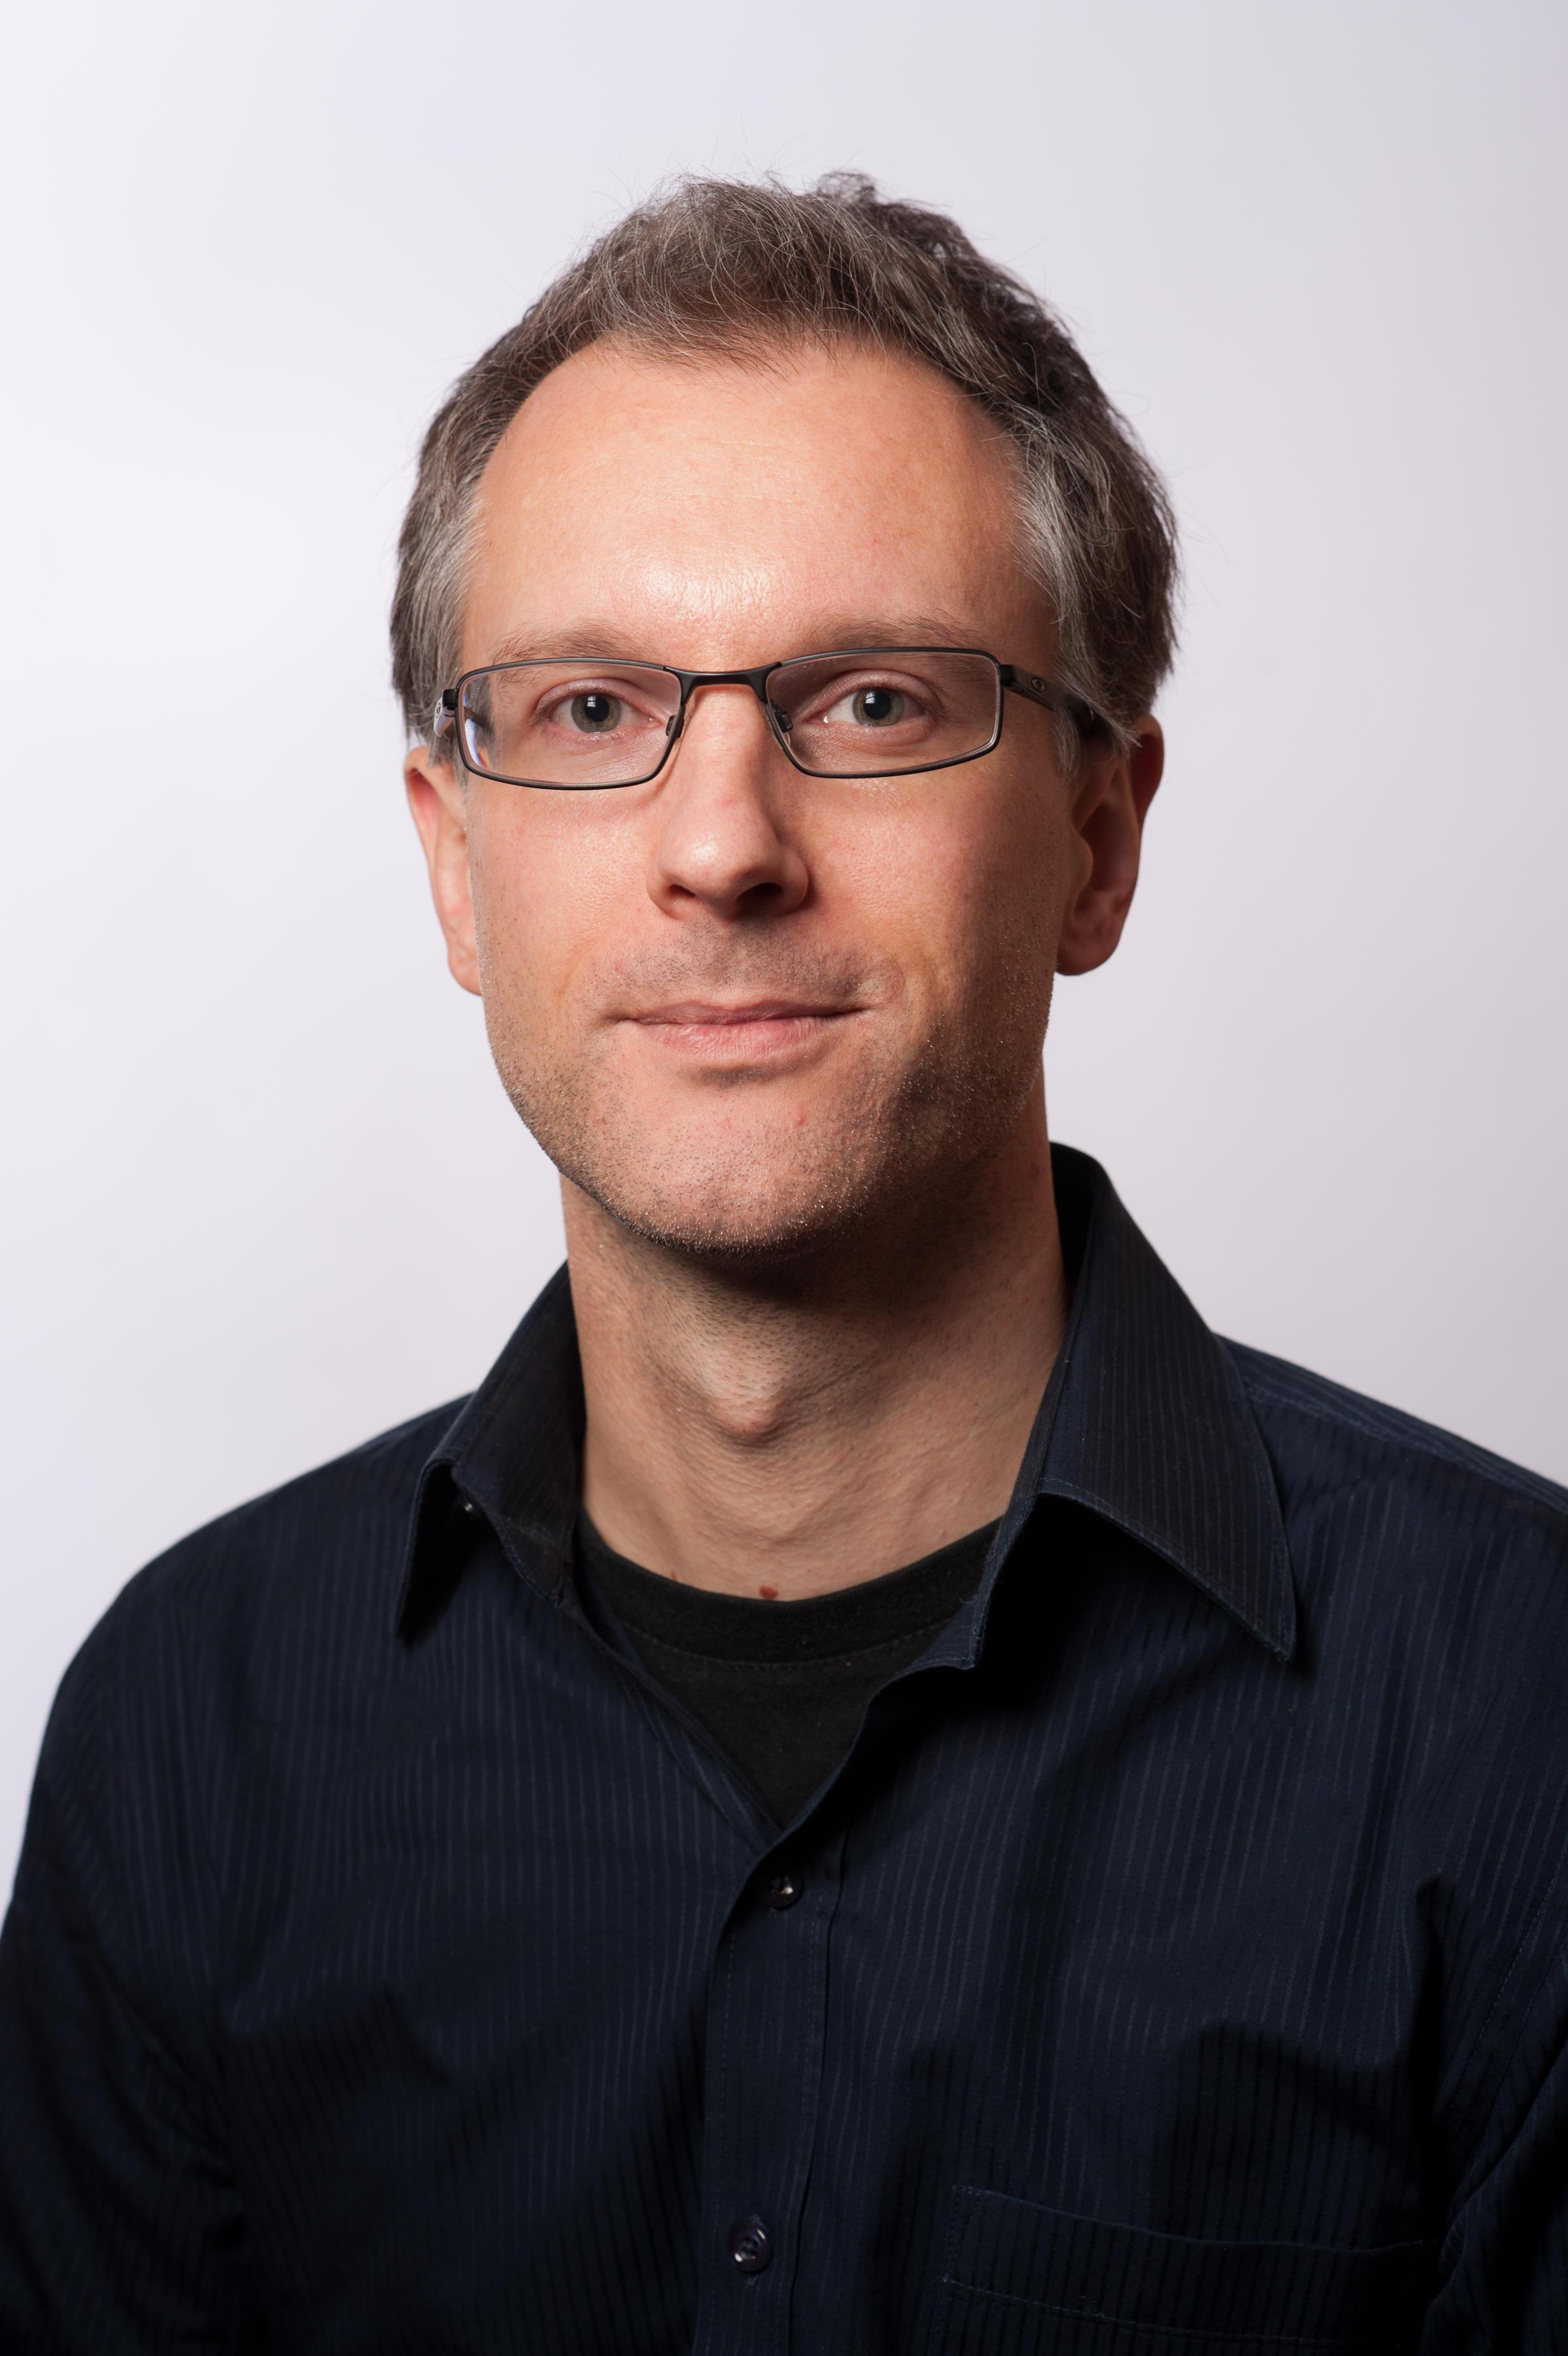 Florian Jäger